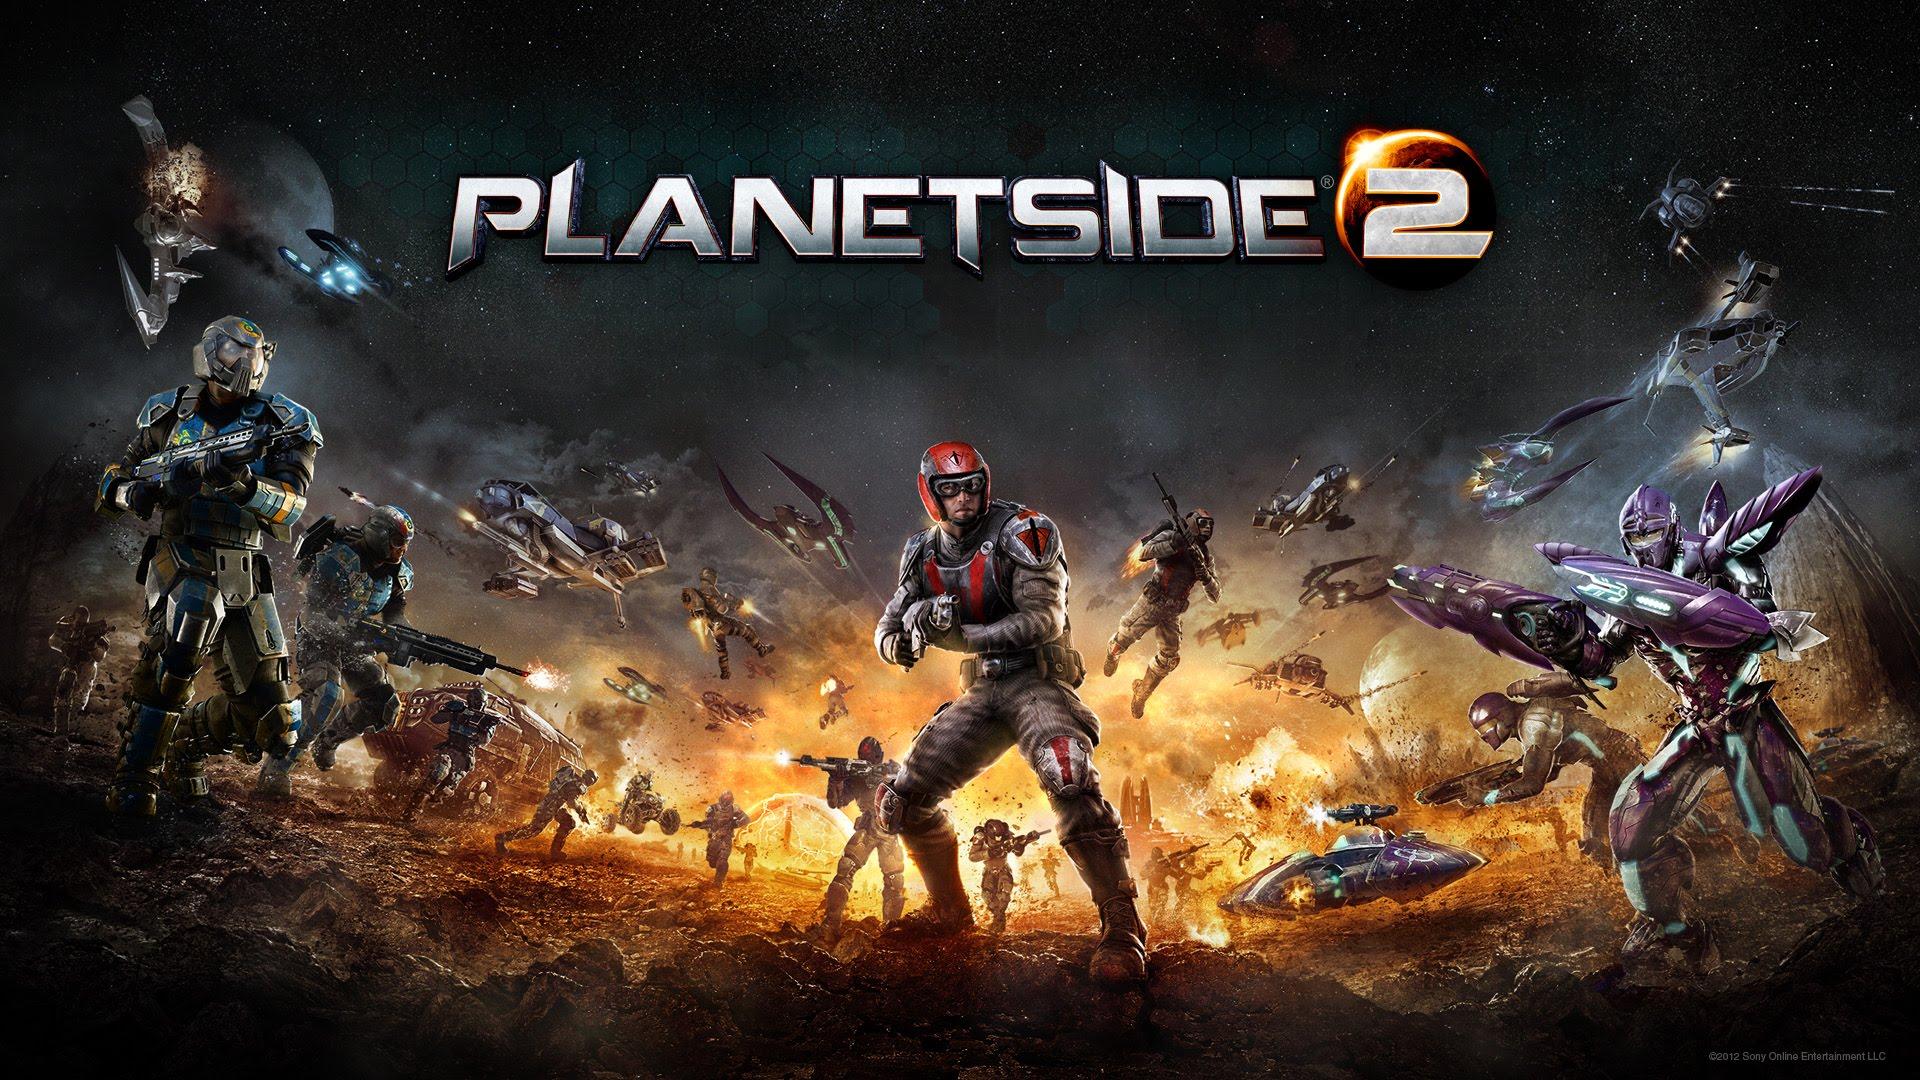 PlanetSide 2 PS4 Beta ab Mitte Dezember 2014